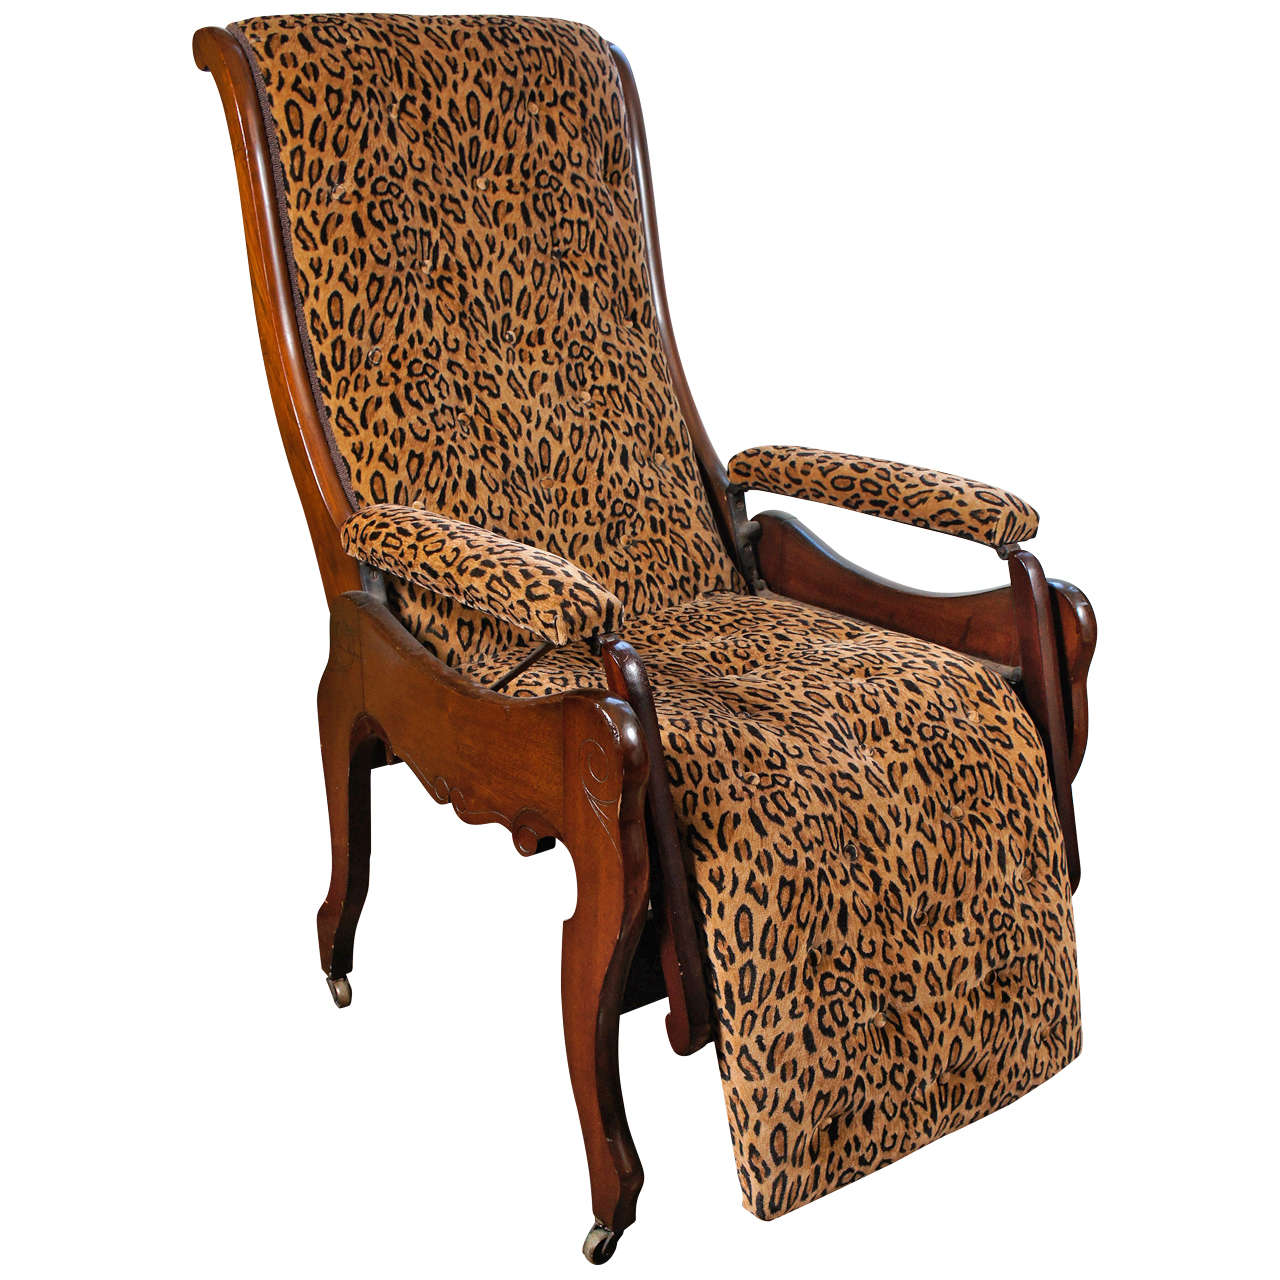 Mahogany Reclining Chair, circa 1850